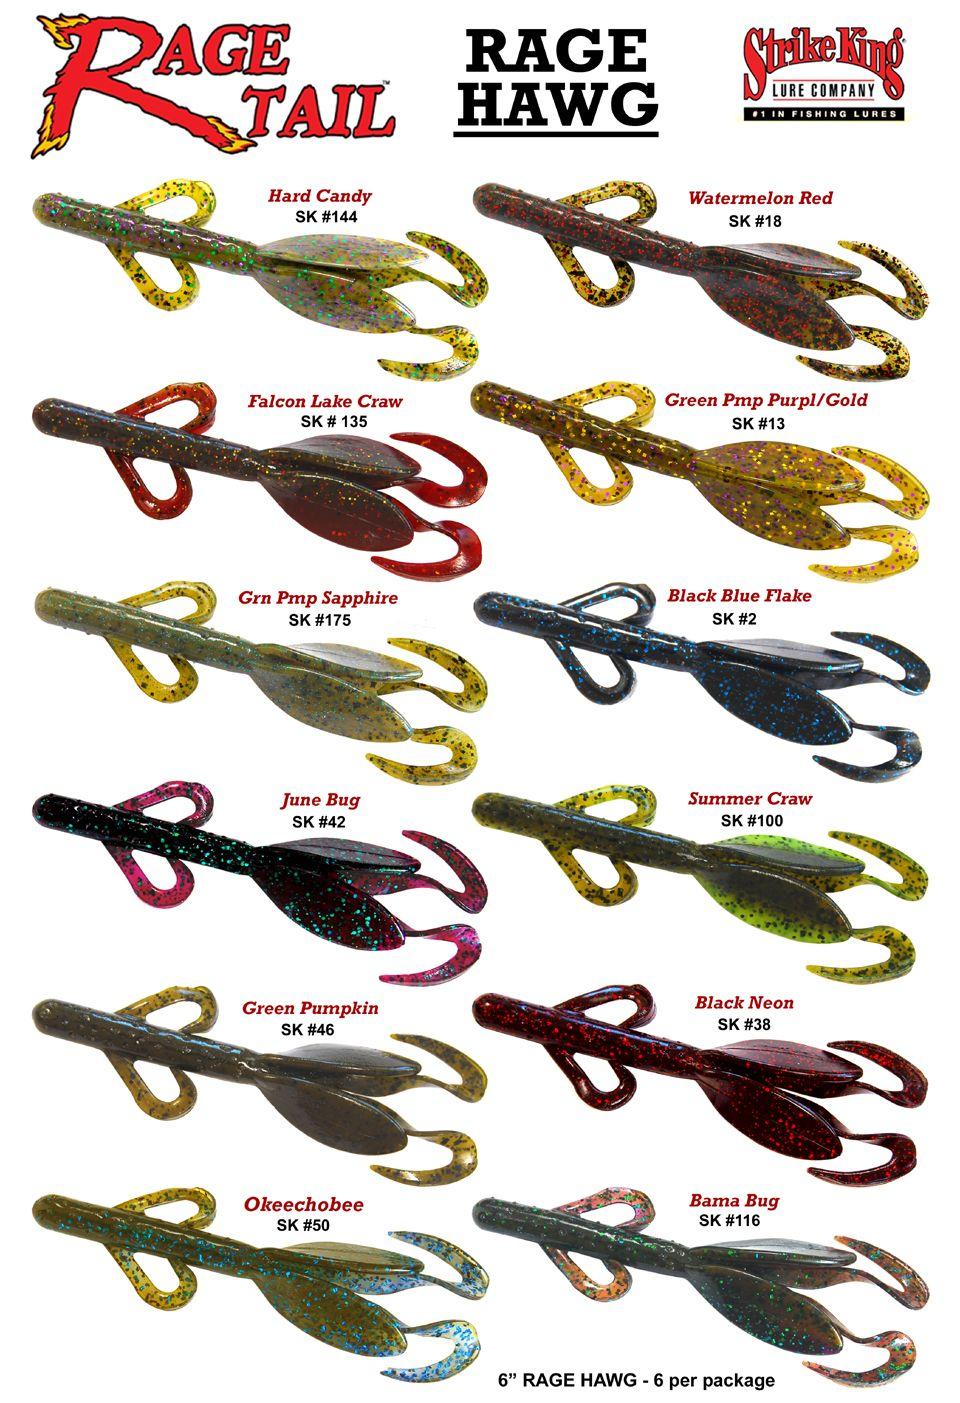 Rage hawg color selection chart fishing pinterest fish bass fishing equipment rage hawg color selection chart nvjuhfo Image collections